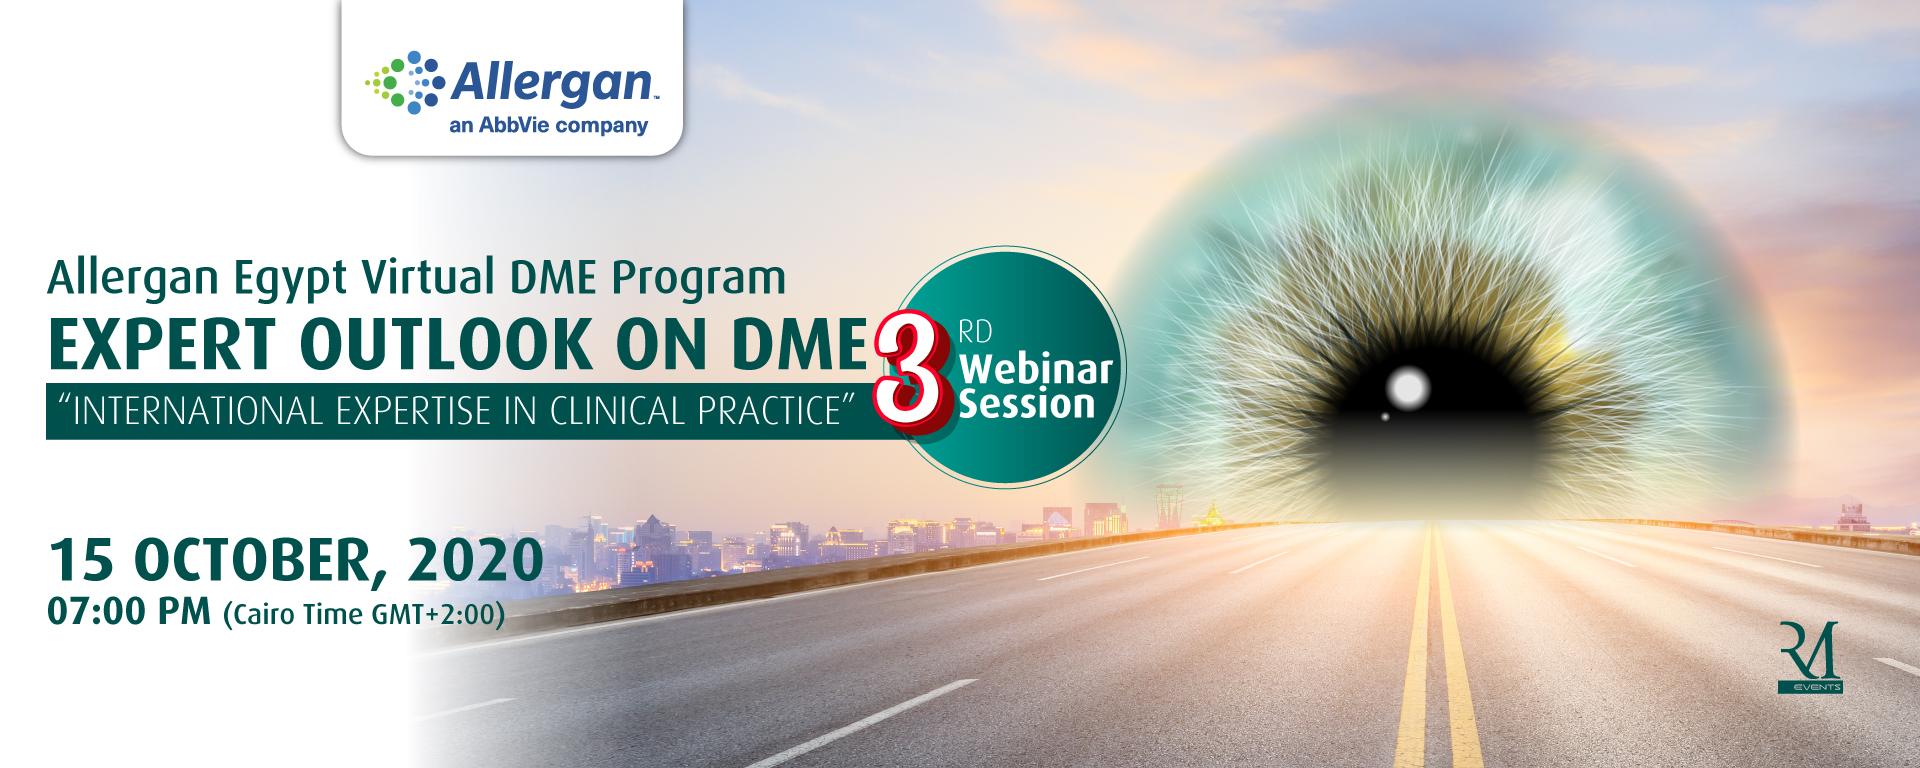 3rd Allergan Egypt Virtual DME Program